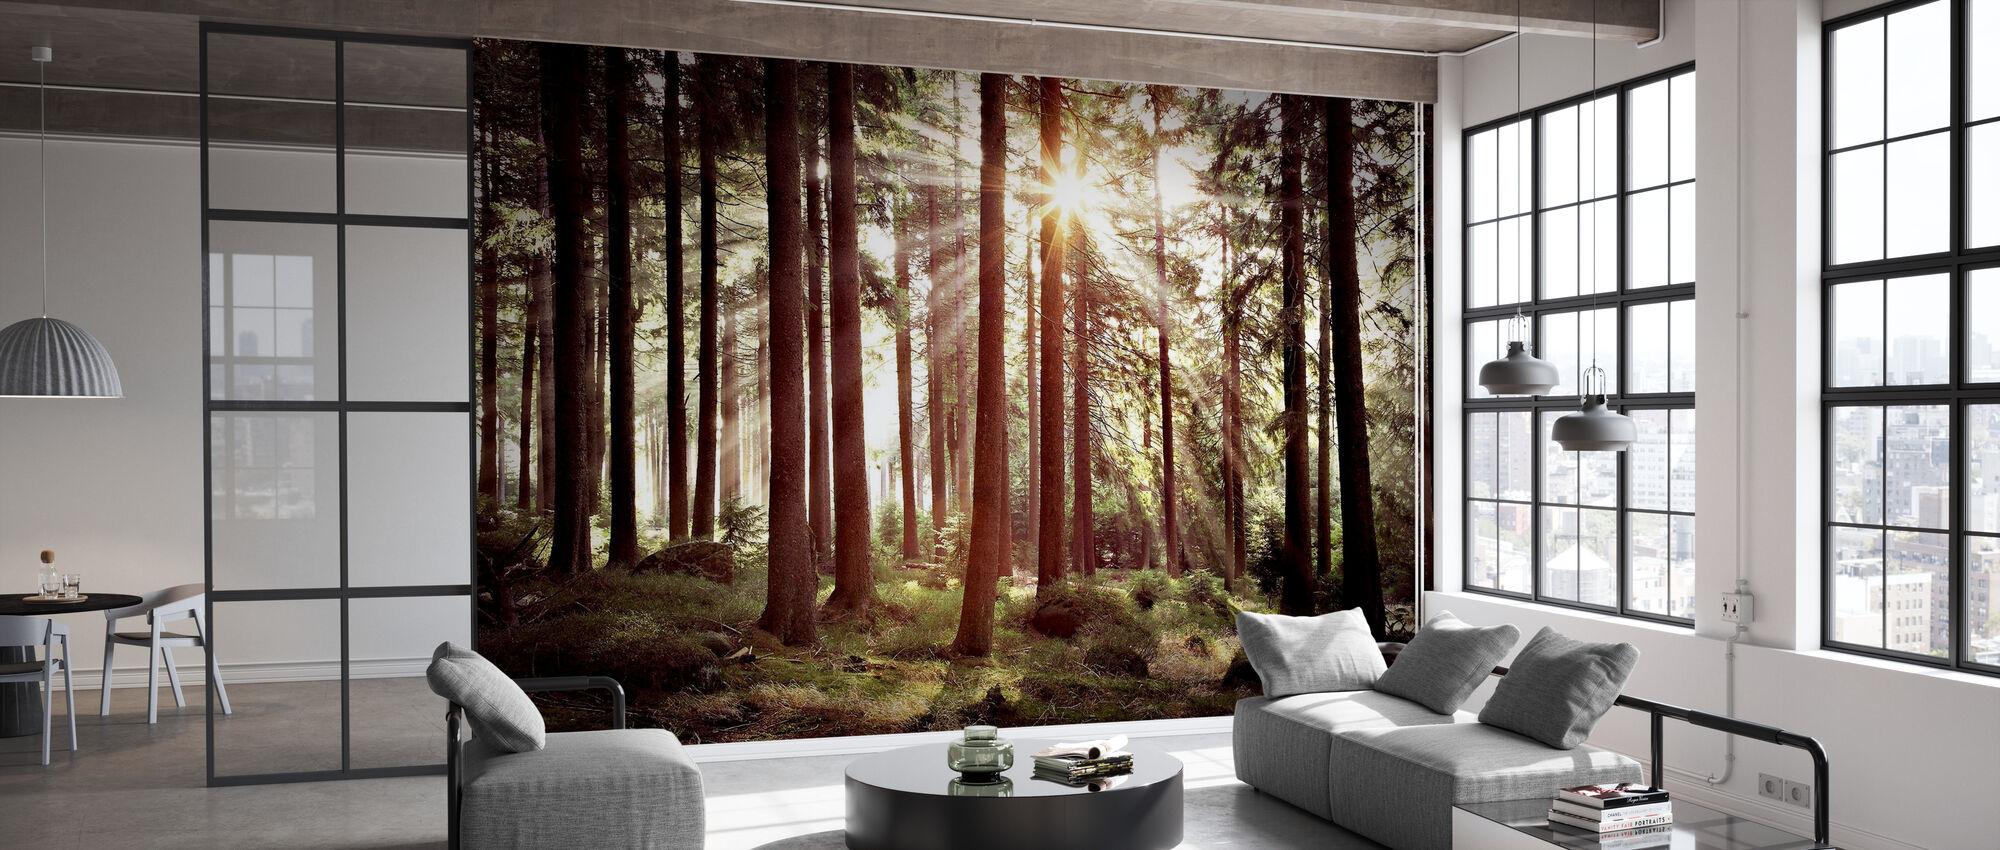 Sunbeam Through Trees - Retro - Wallpaper - Office